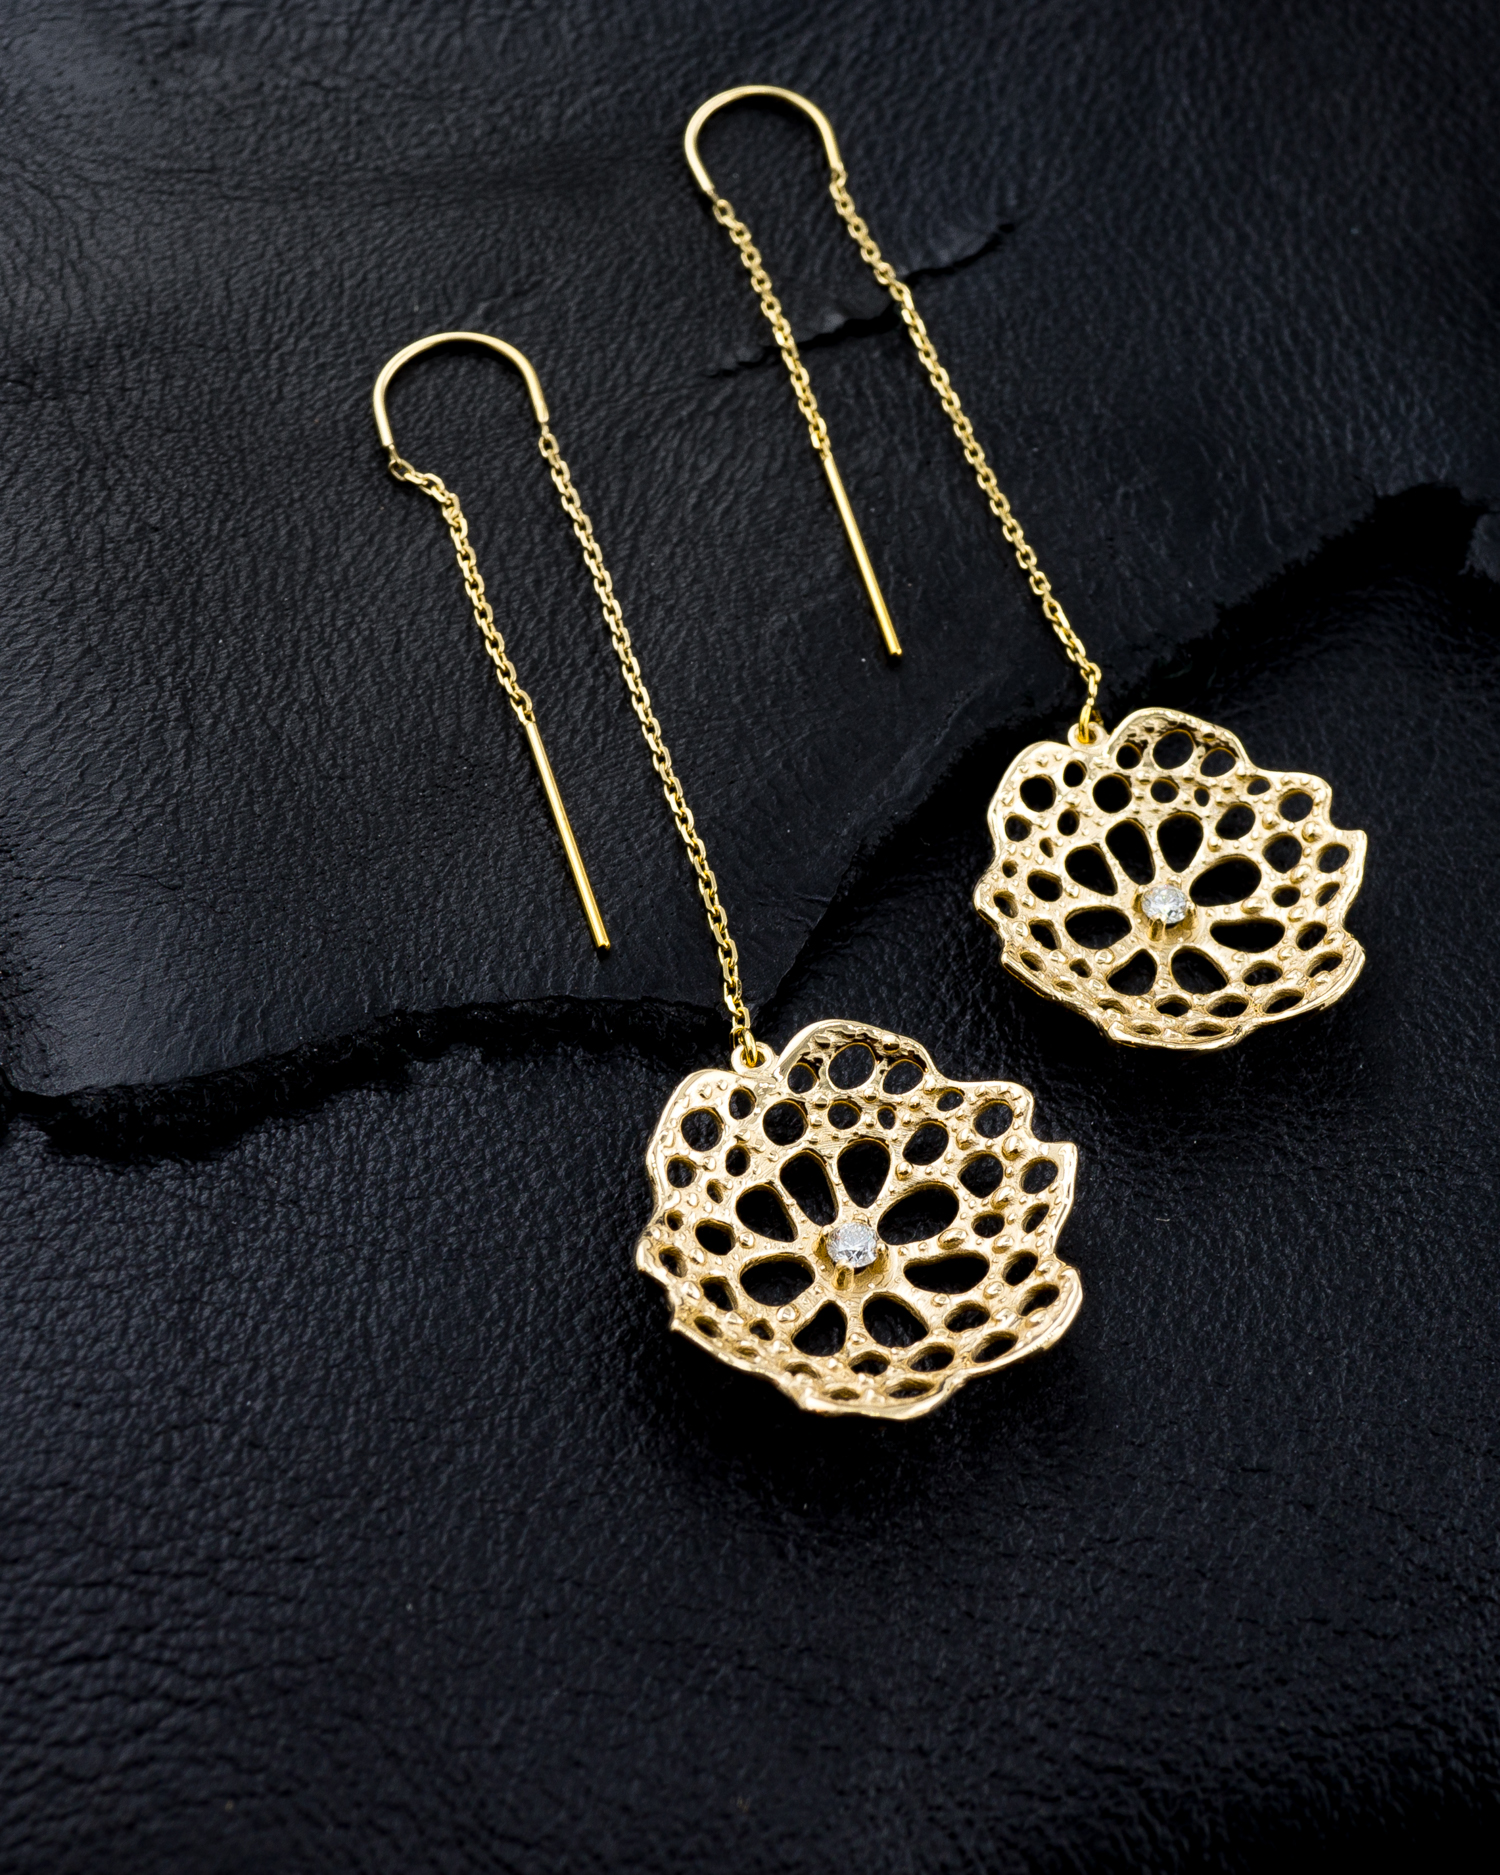 Beneath the Surface earrings: Yellow gold, white diamonds.